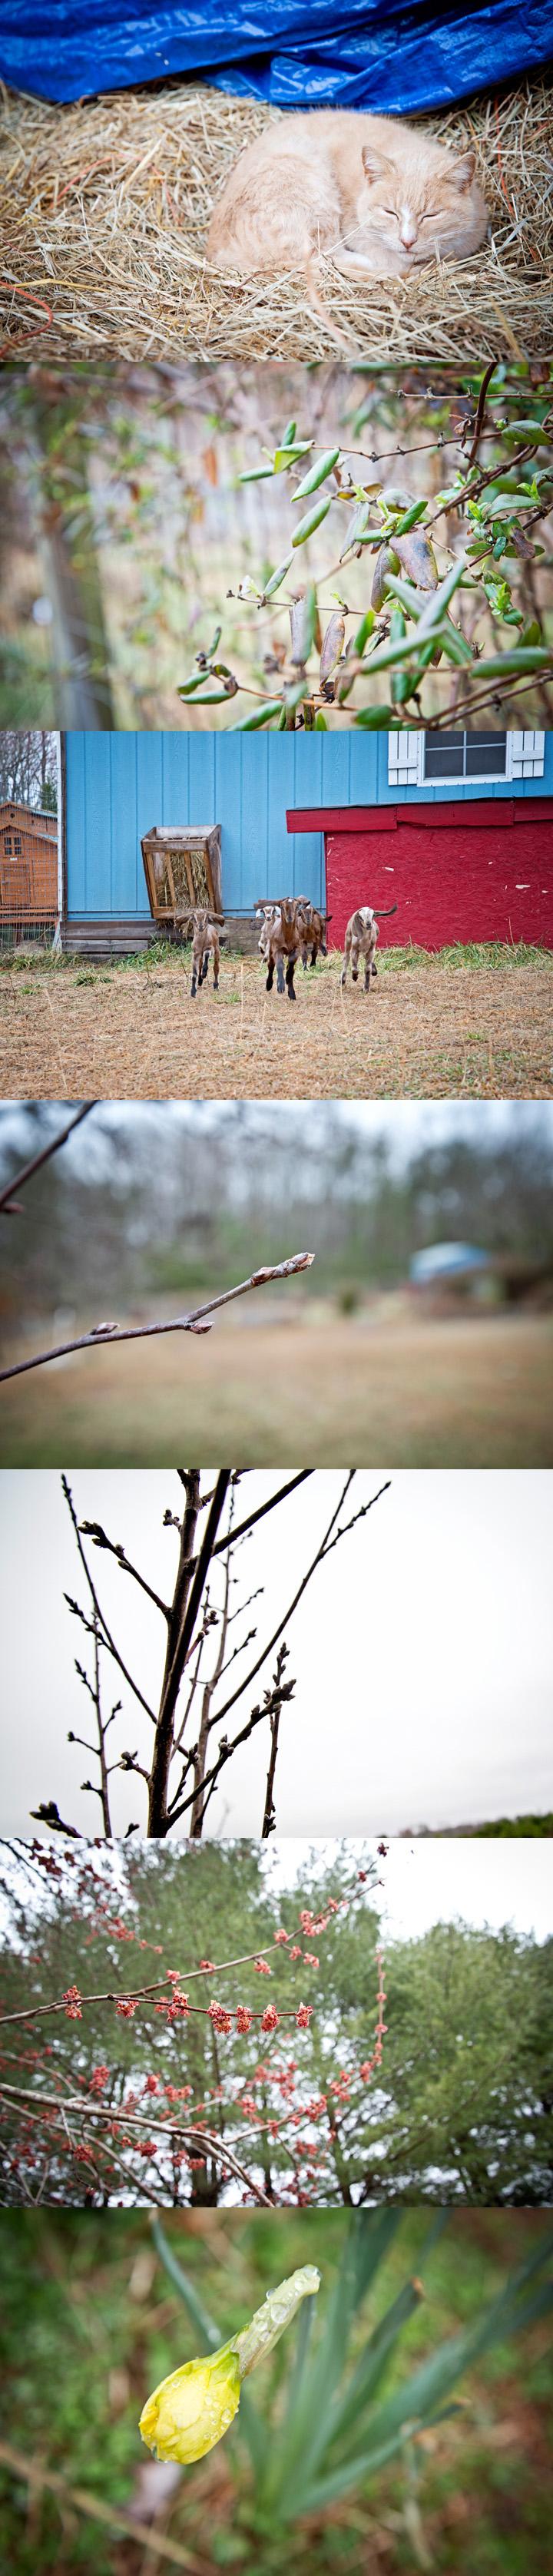 Budding Spring around The Freckled Farm